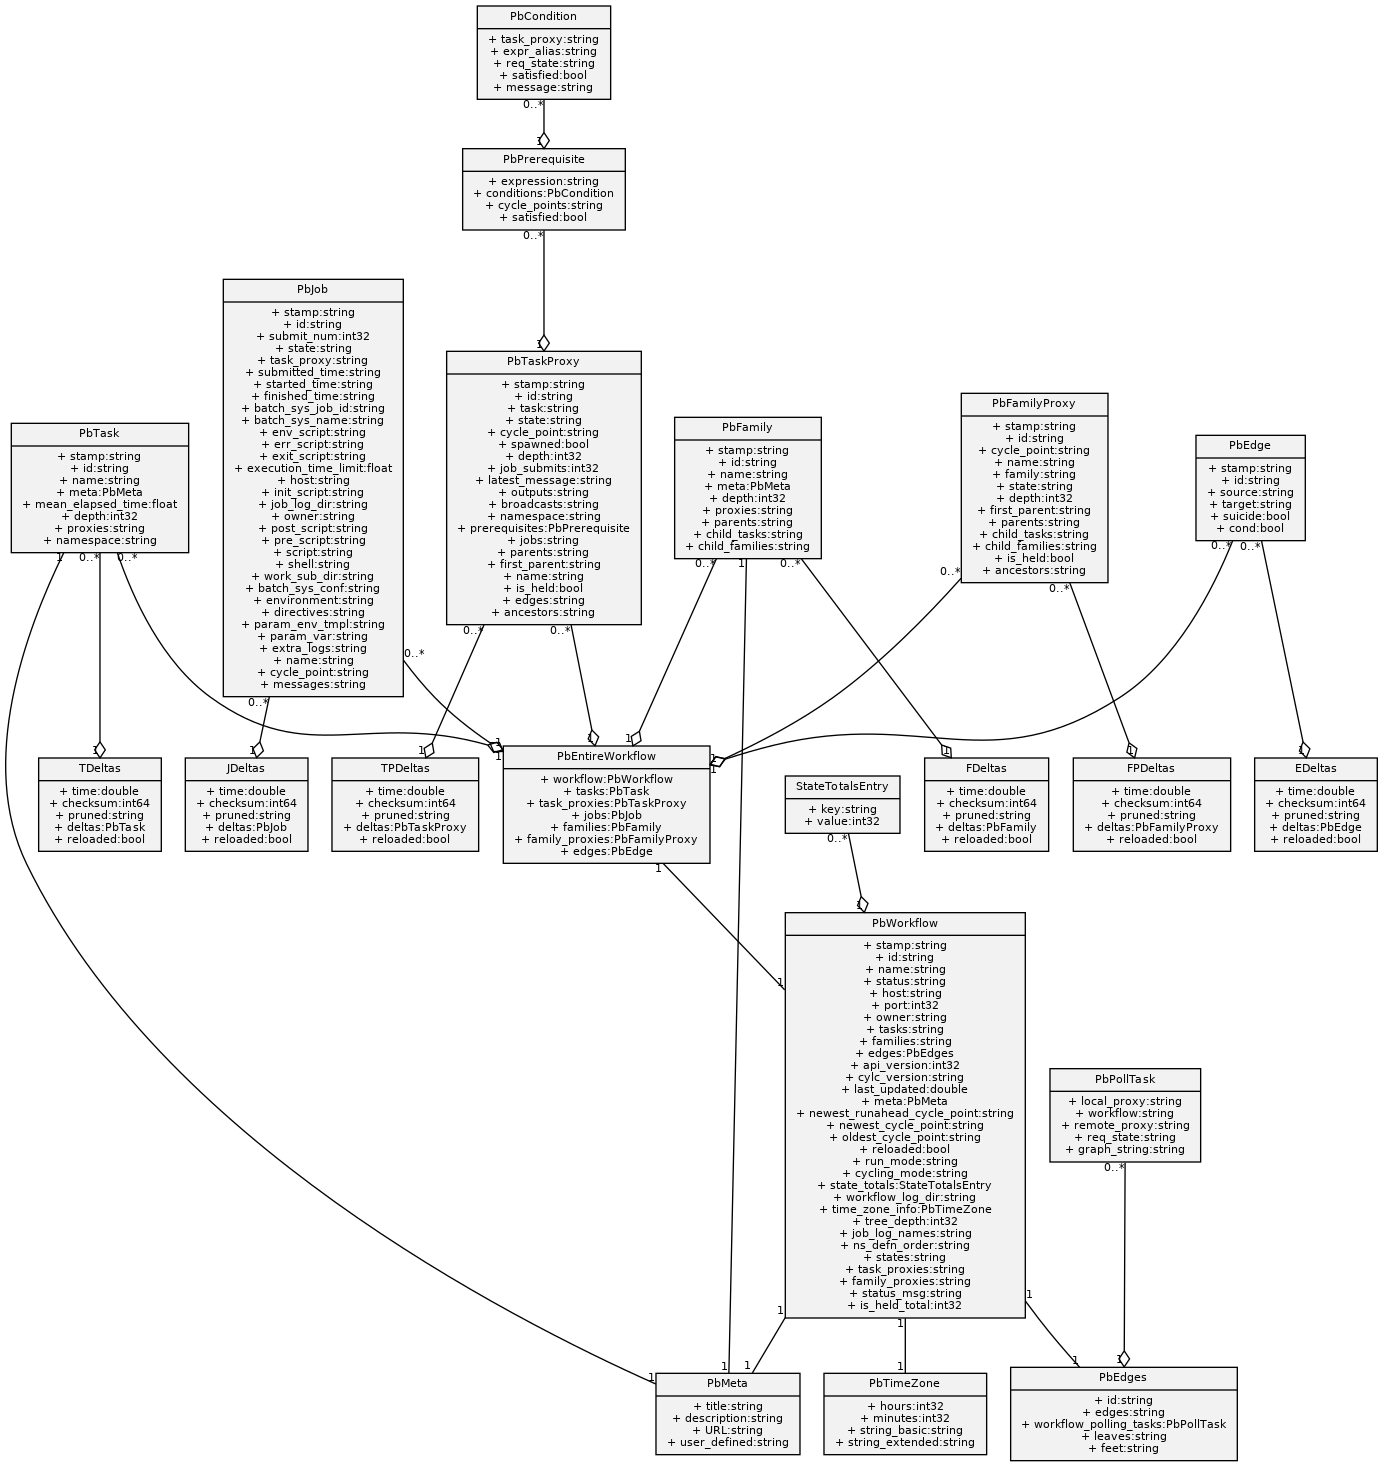 GitHub - kinow/protobuf-uml-diagram: Create UML diagrams ...